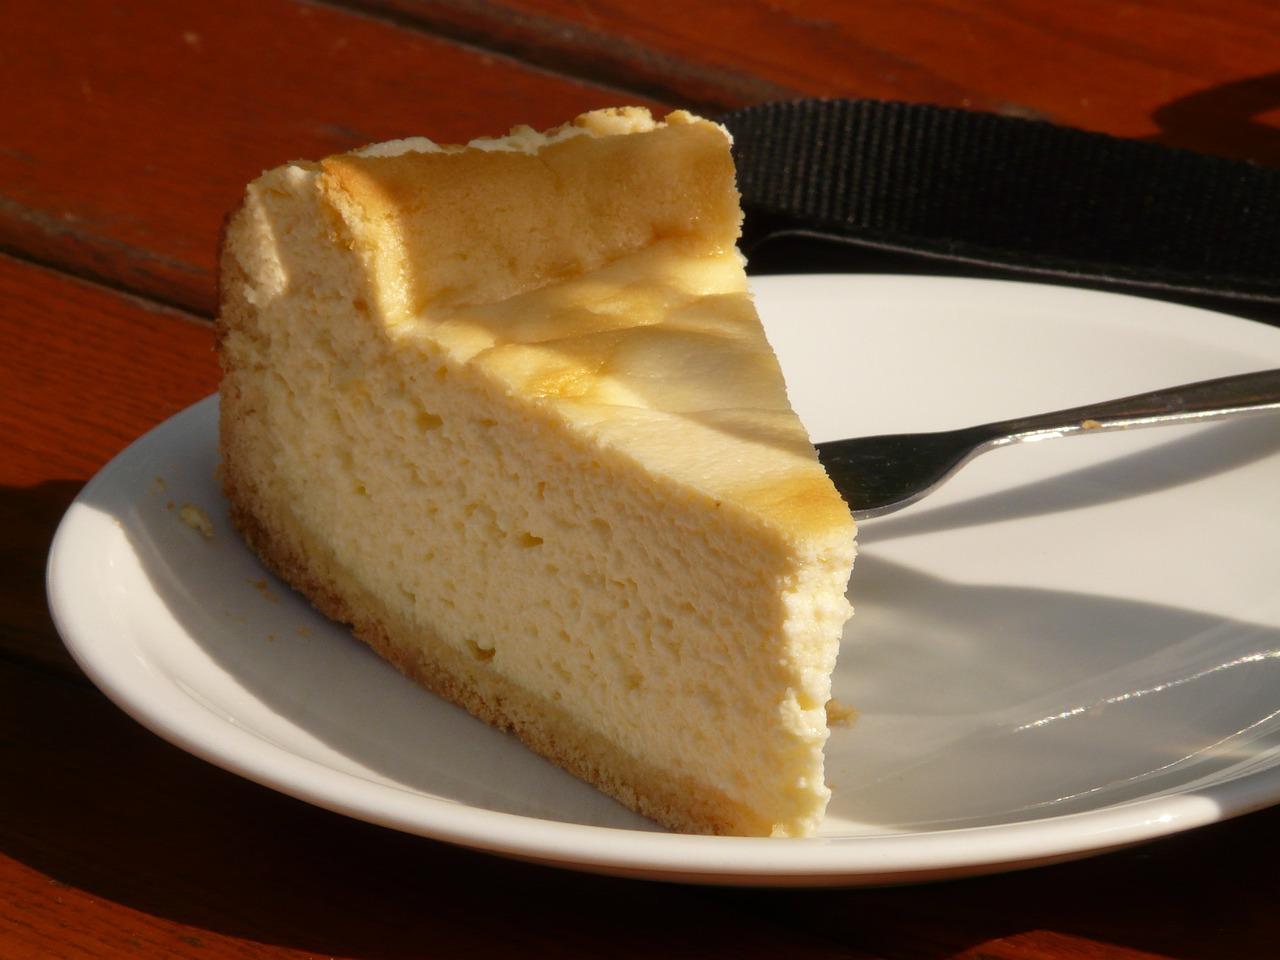 Cake 862 1280